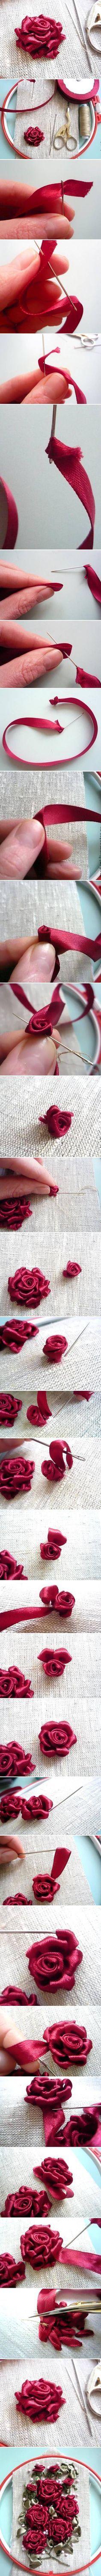 Rosa feita de fita de cetim.